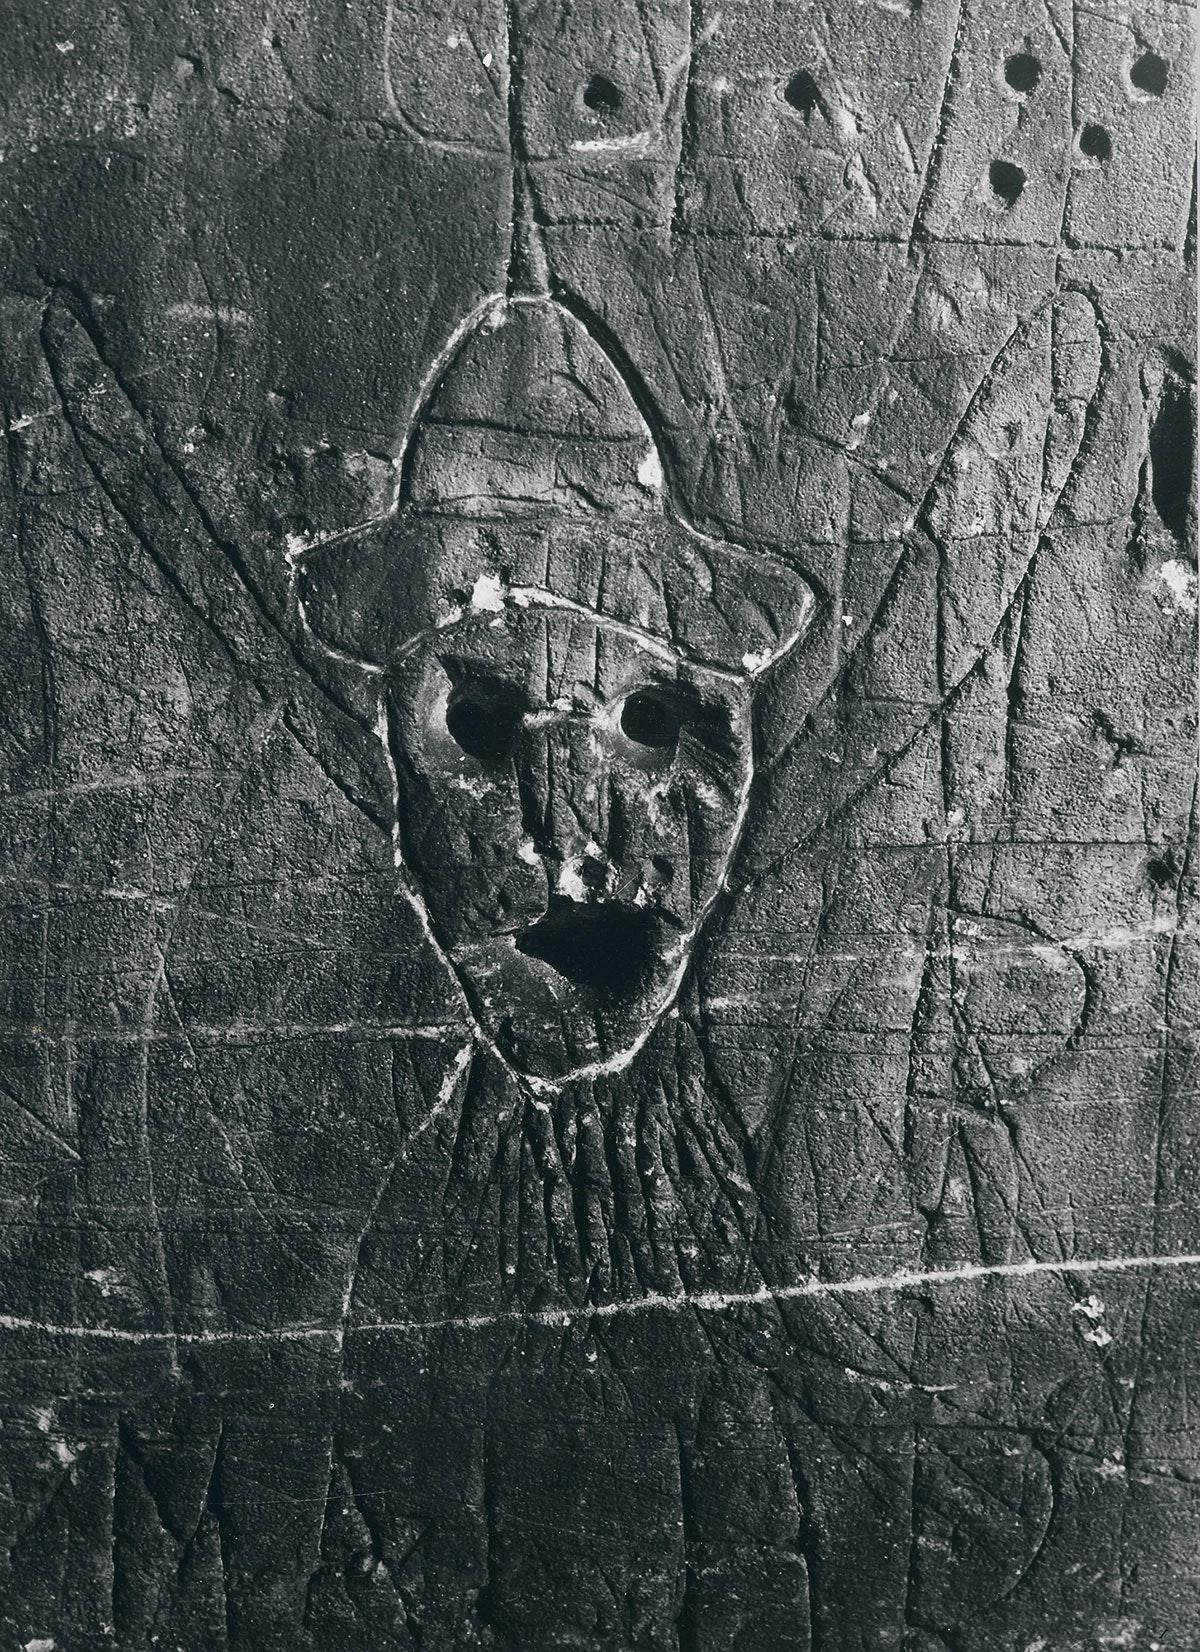 Brassaiï, <em>Graffiti de la série VIII, La magie</em>, 1950. Silver gelatin print, 15 x 11 inches. © Estate Brassaí Succession.